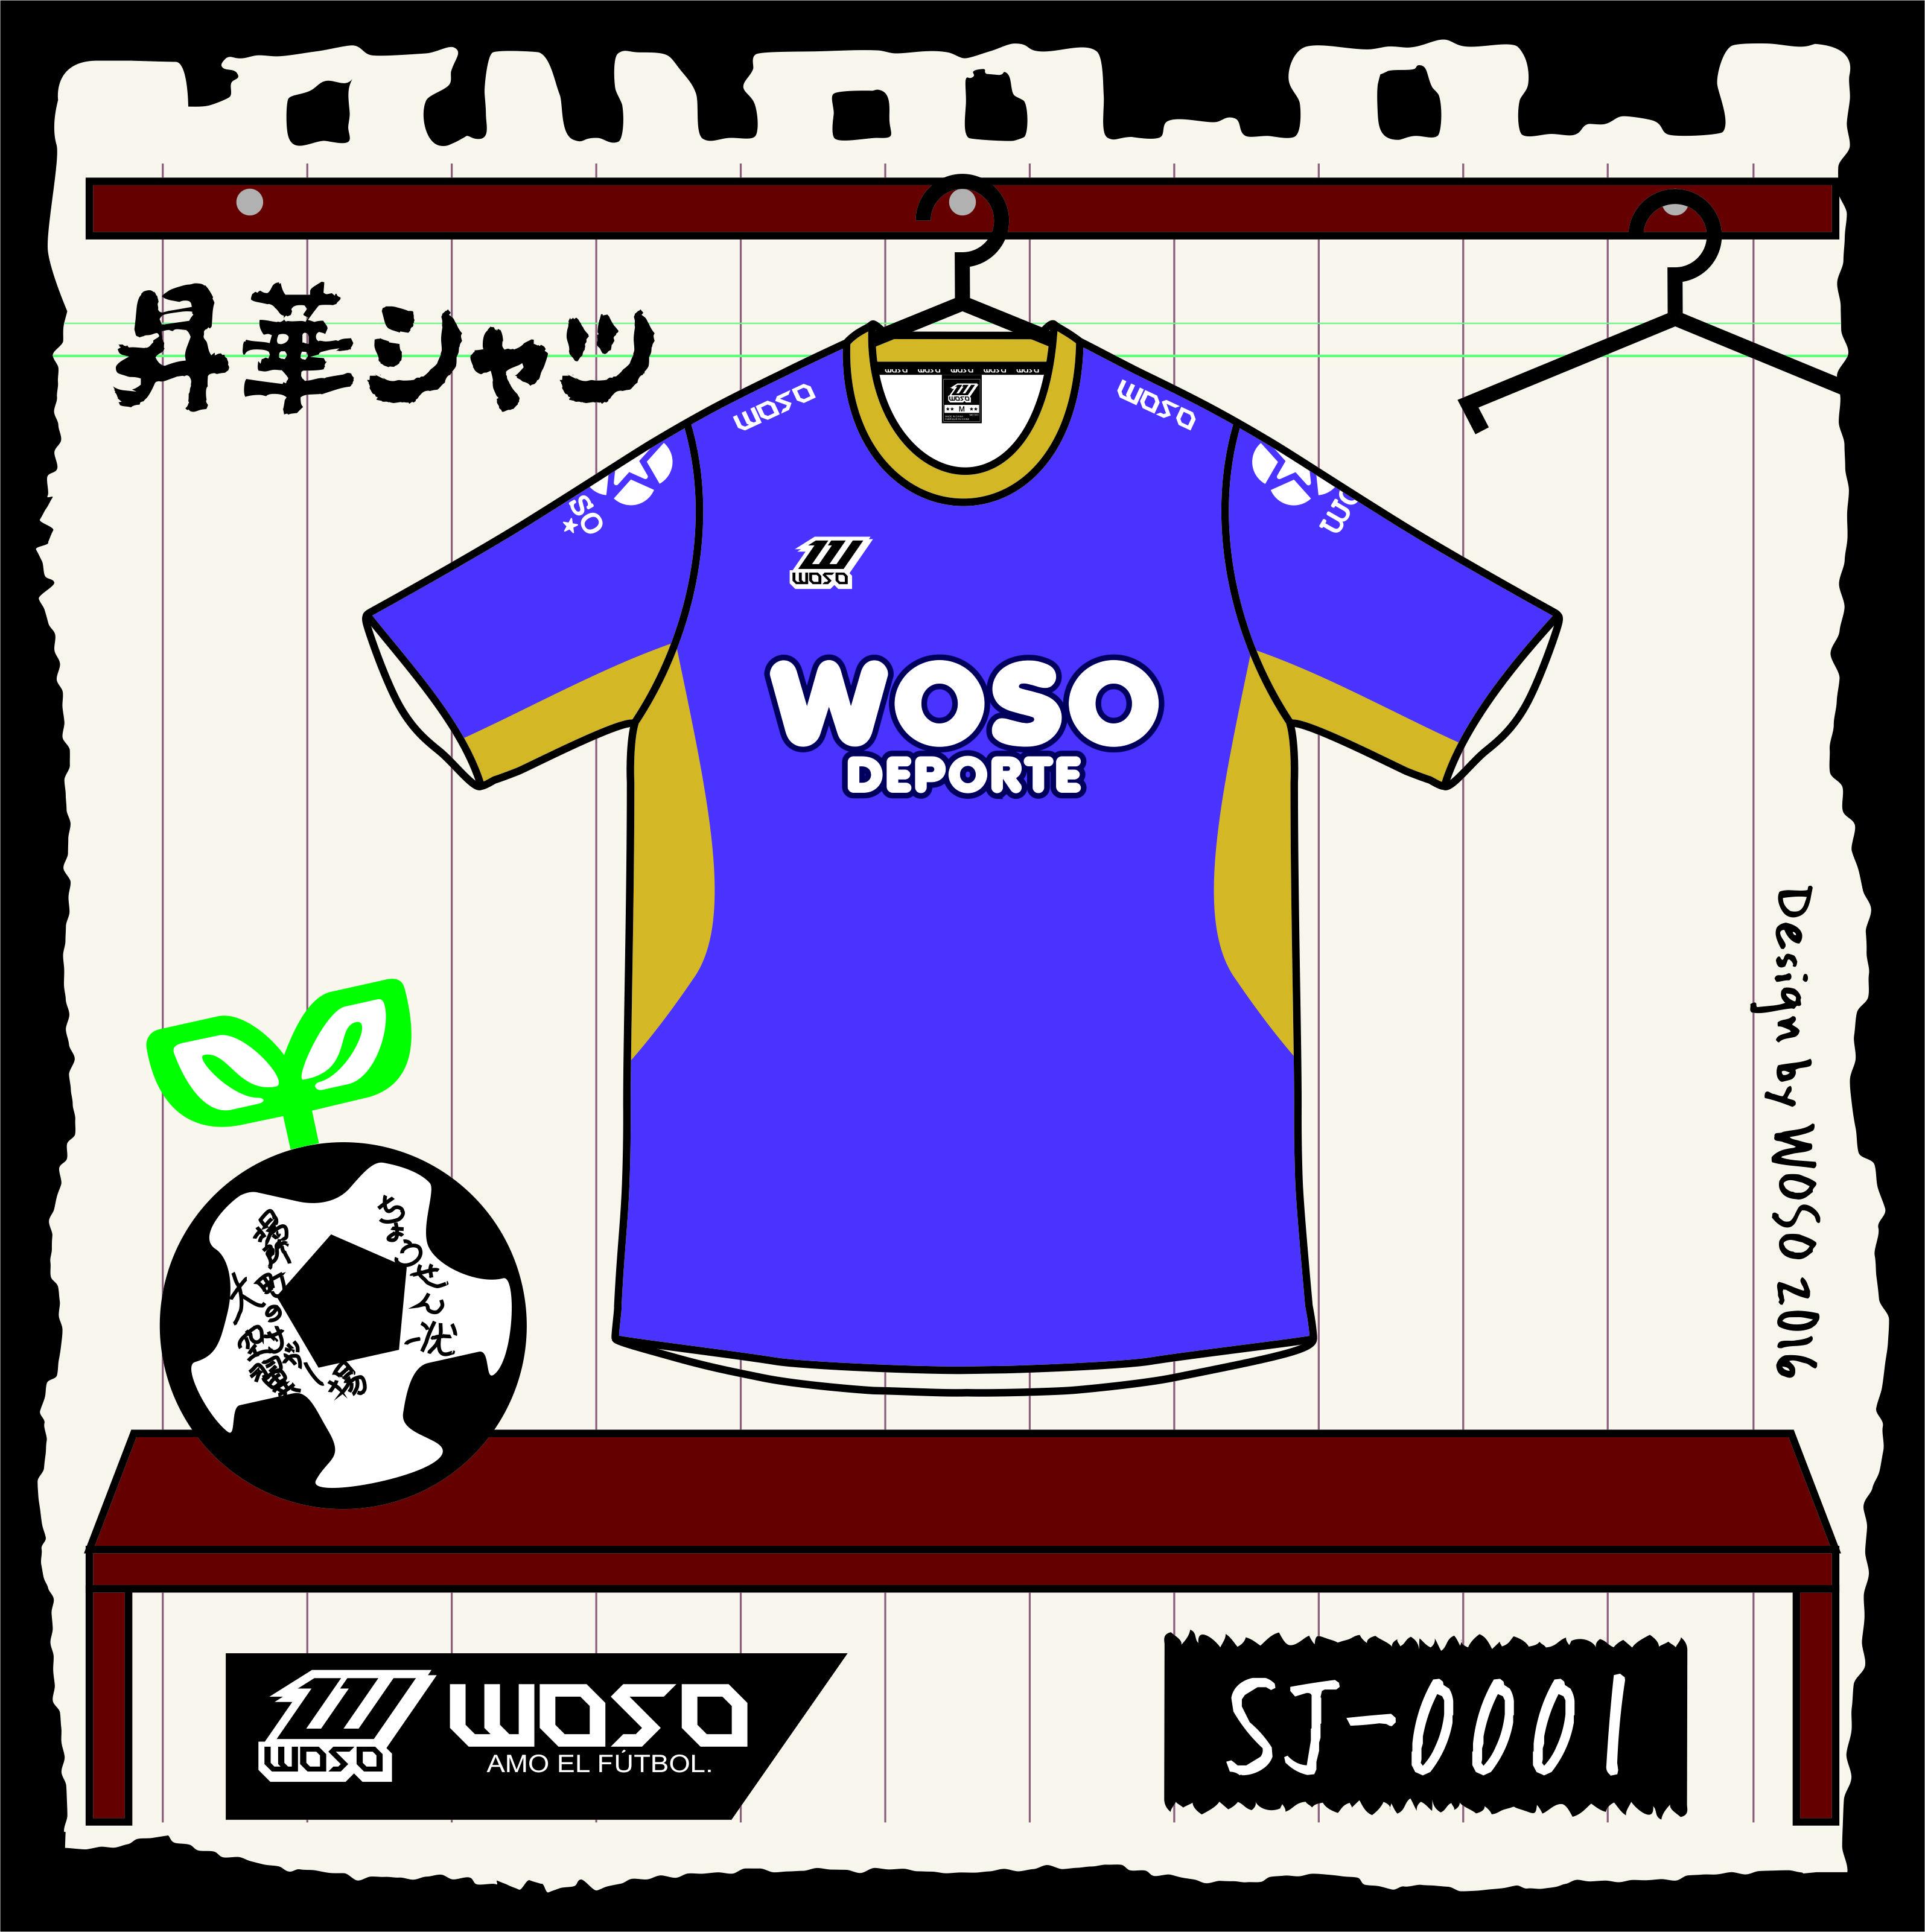 SJ-0001